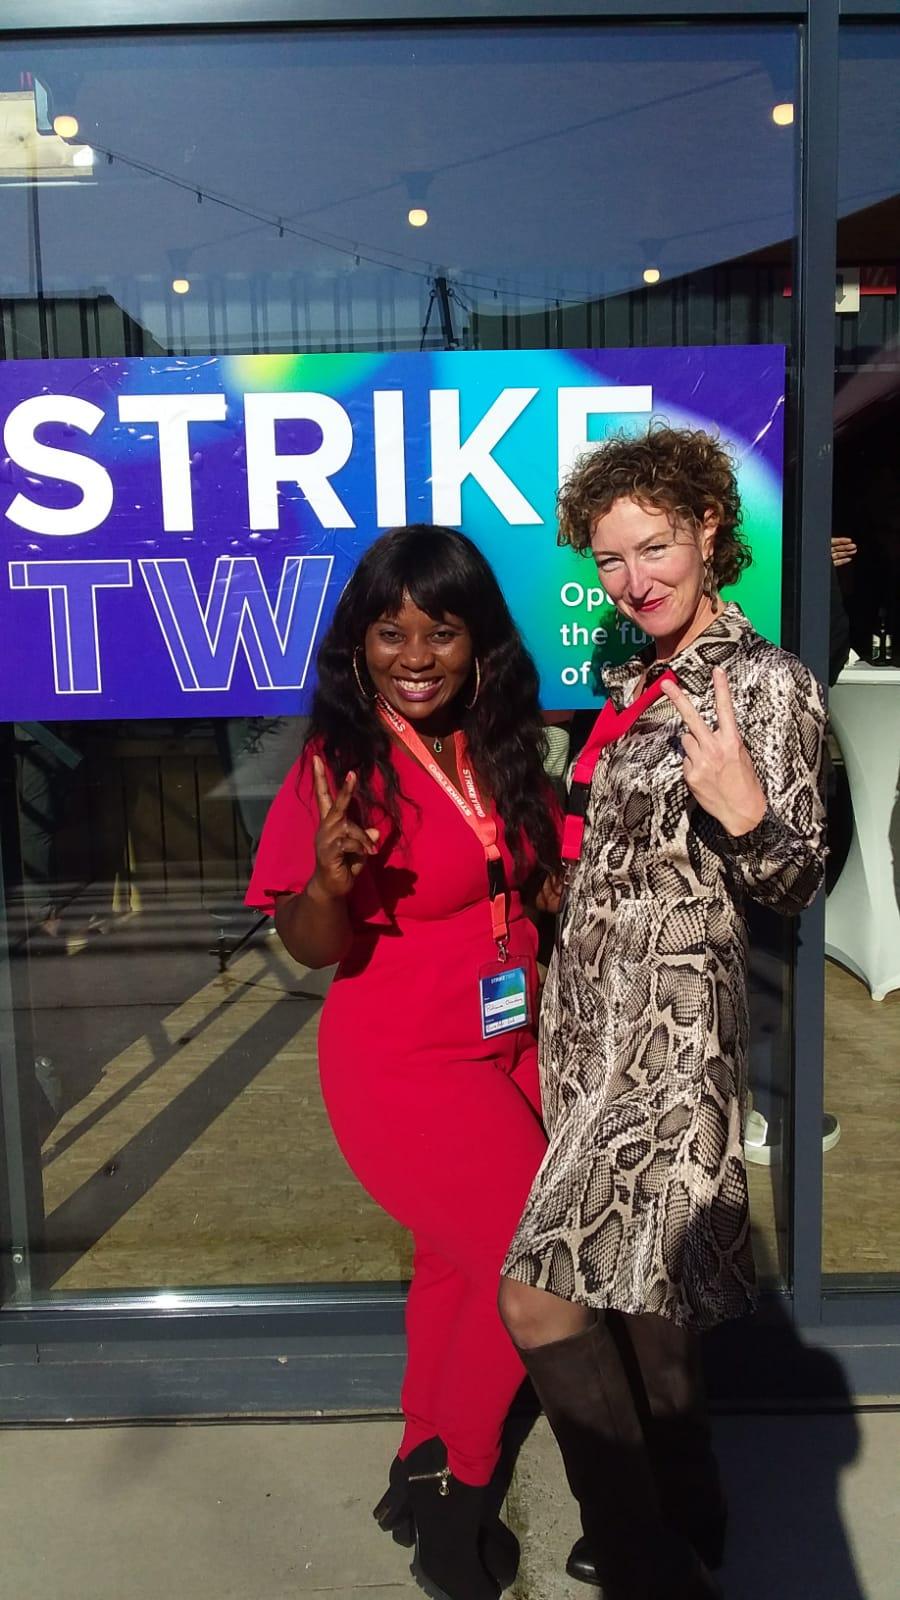 Strike Two Summit - Consumer Trust